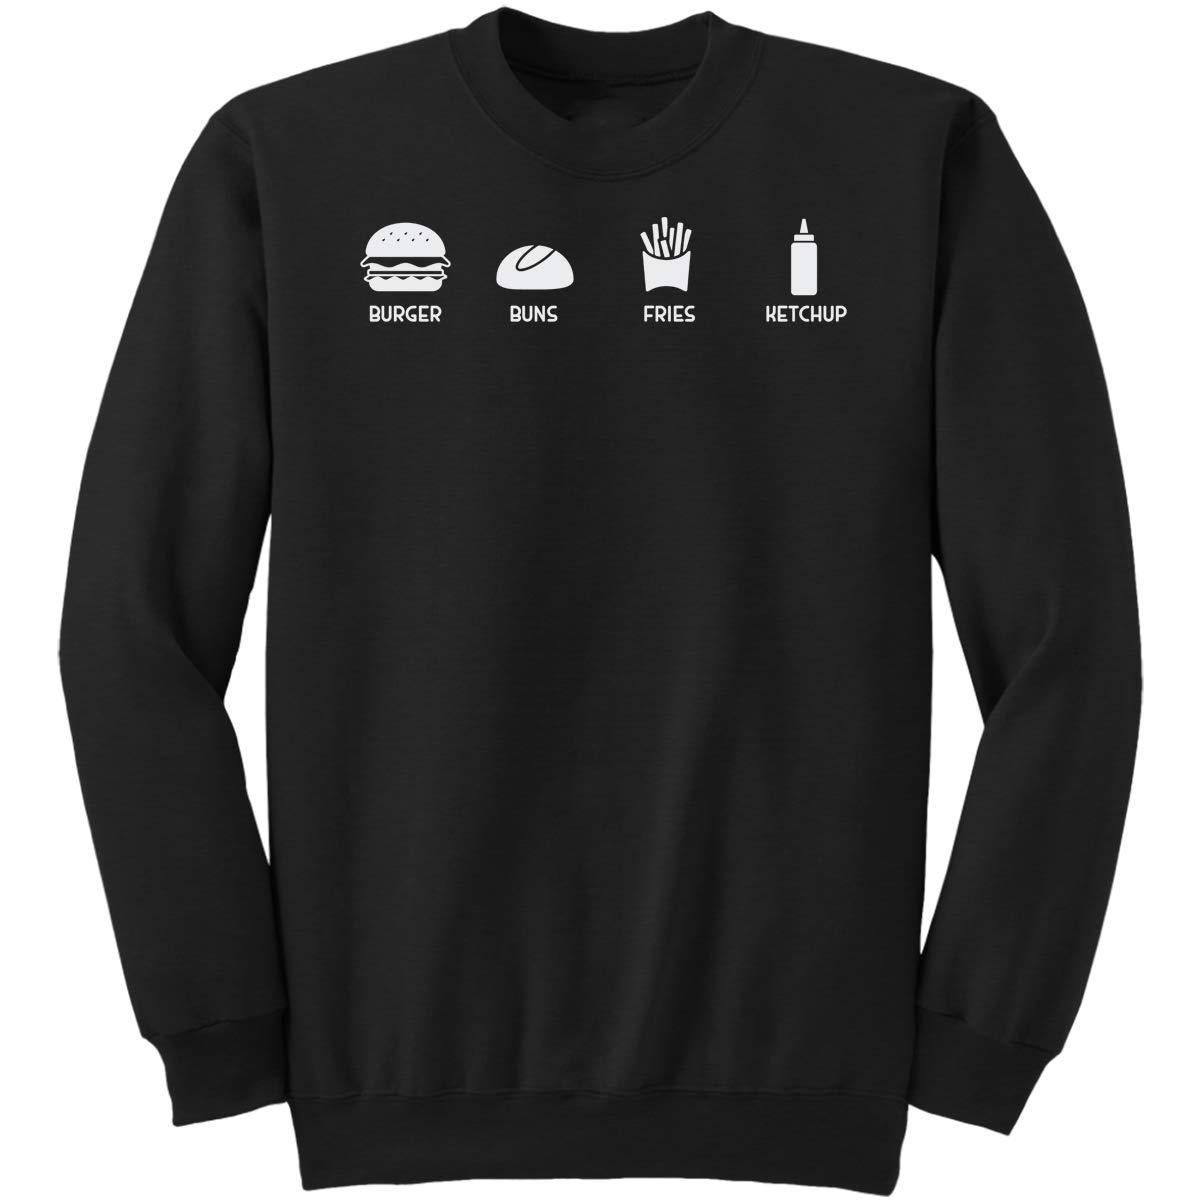 DoozyGifts99 Burger Buns Fries Ketchup-Hamburger Lov Sweatshirt